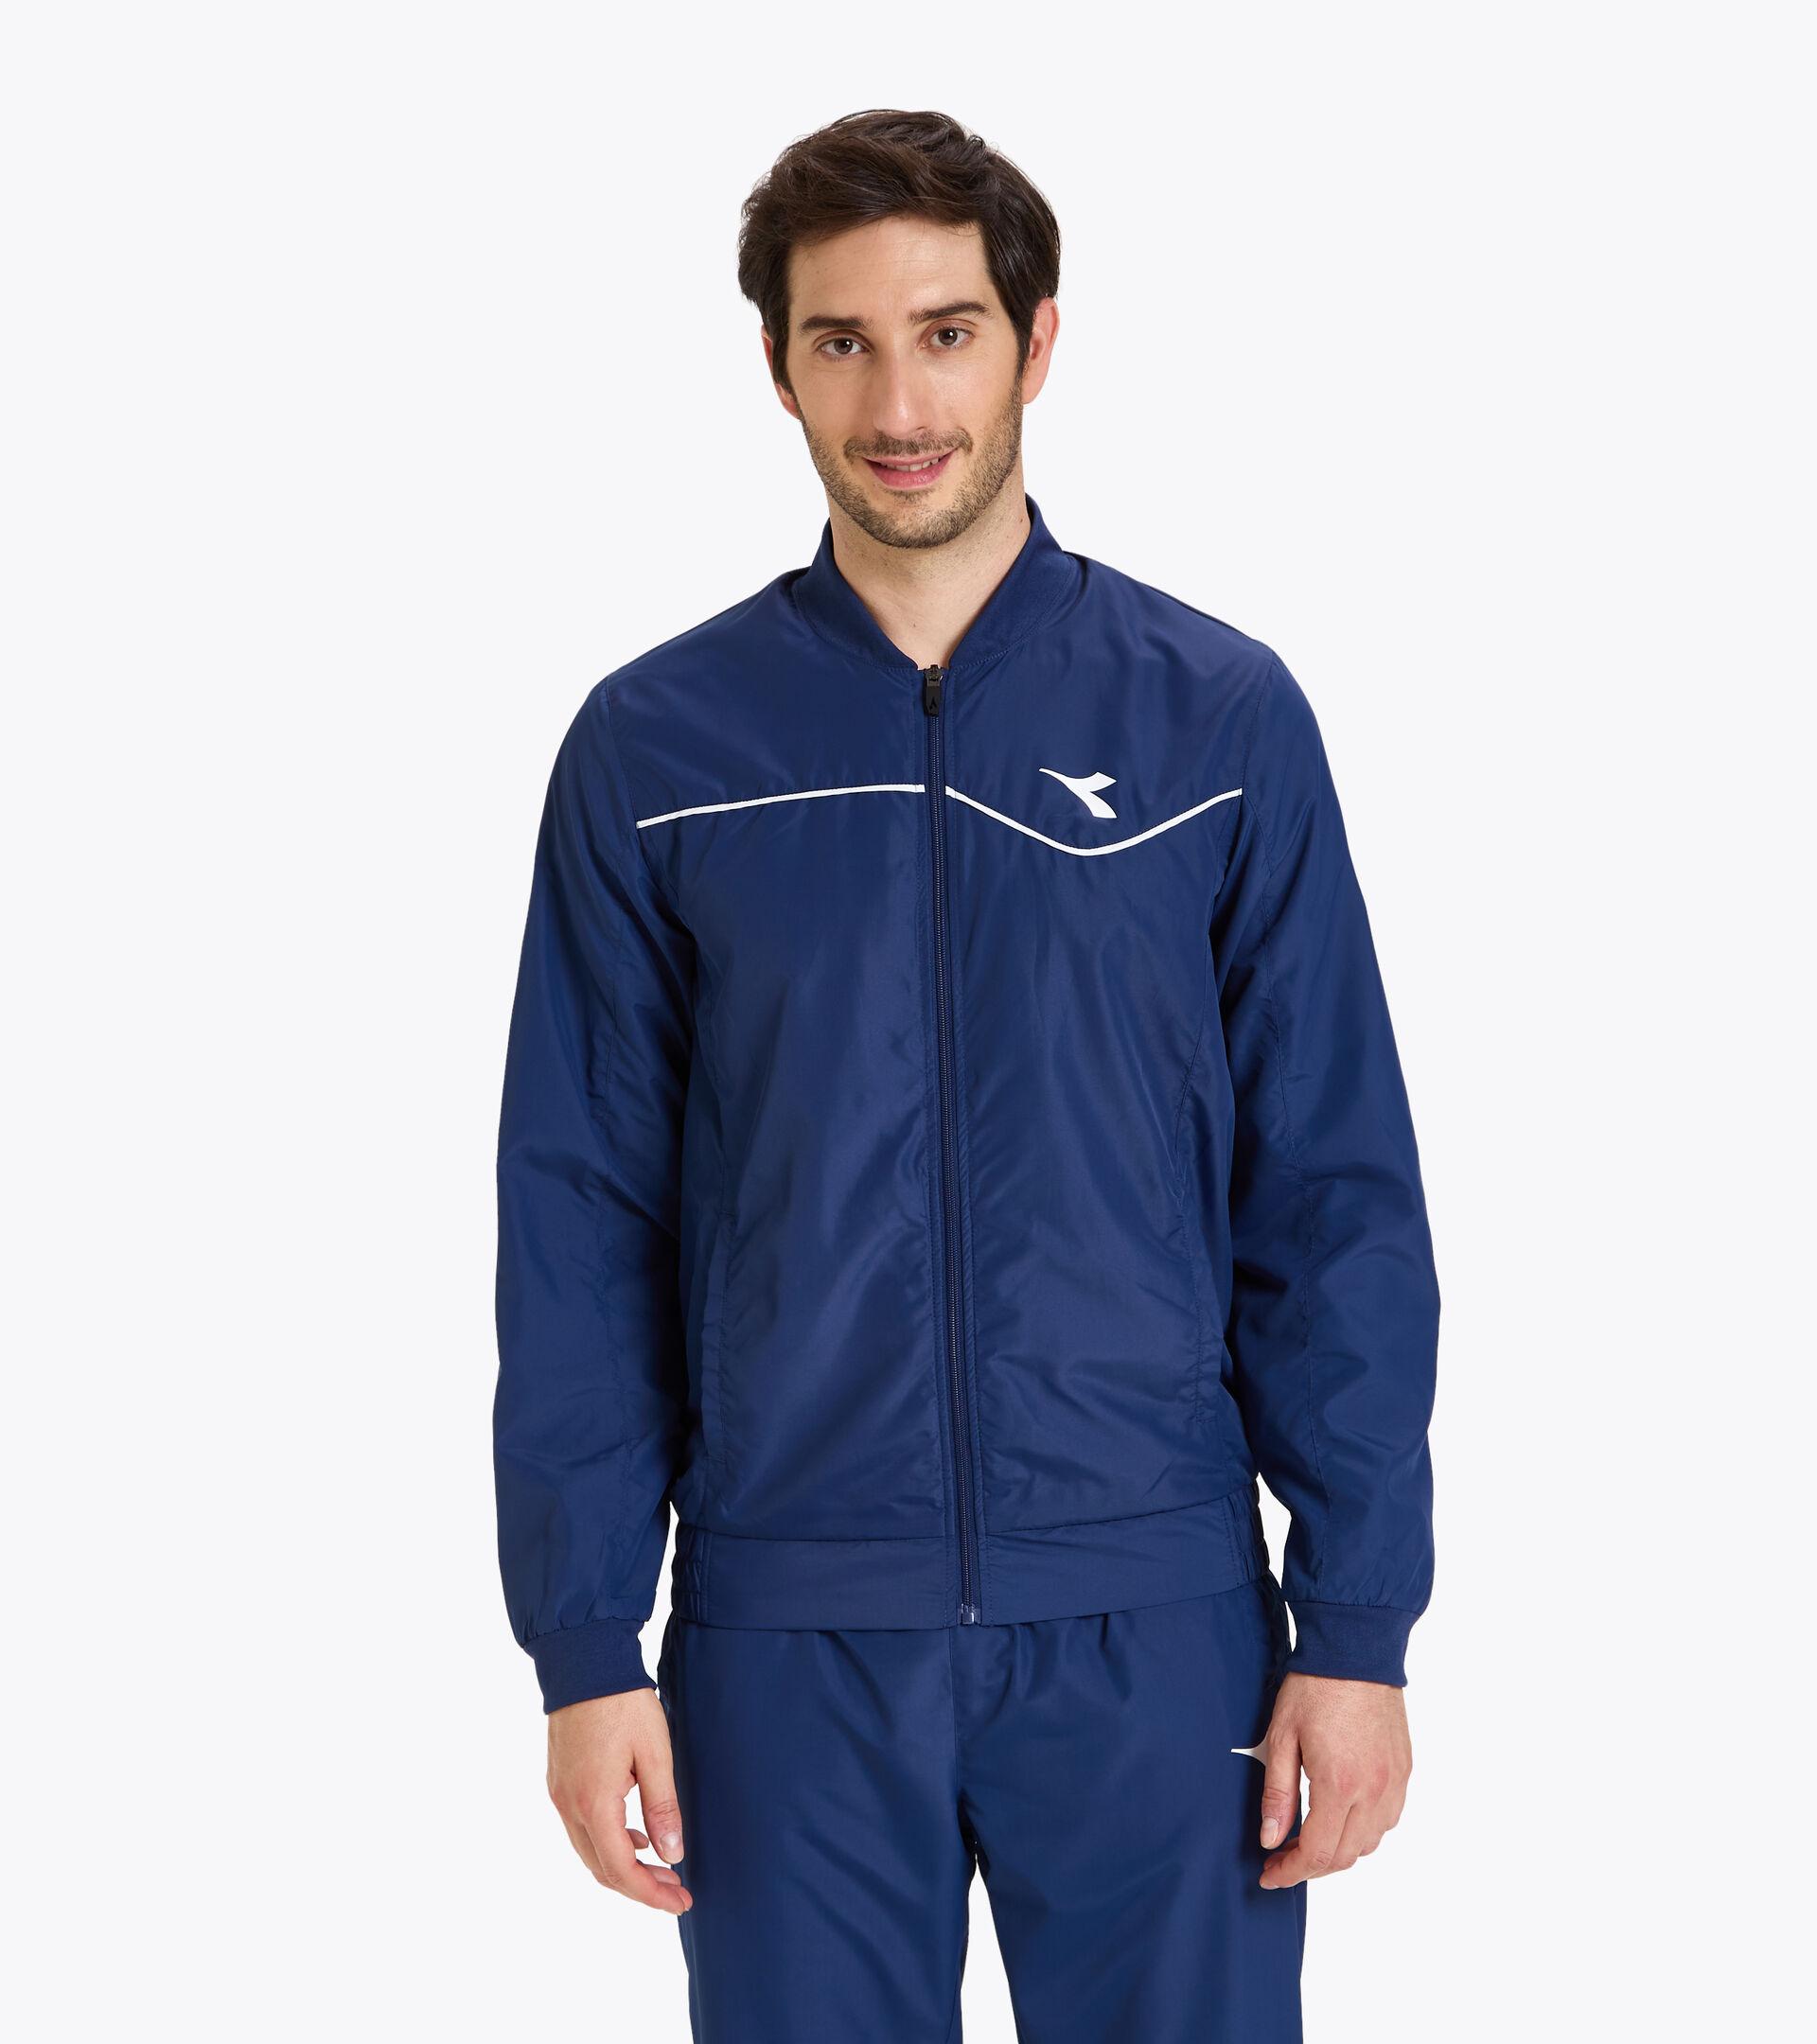 Tennis jacket - Men JACKET COURT SALTIRE NAVY - Diadora